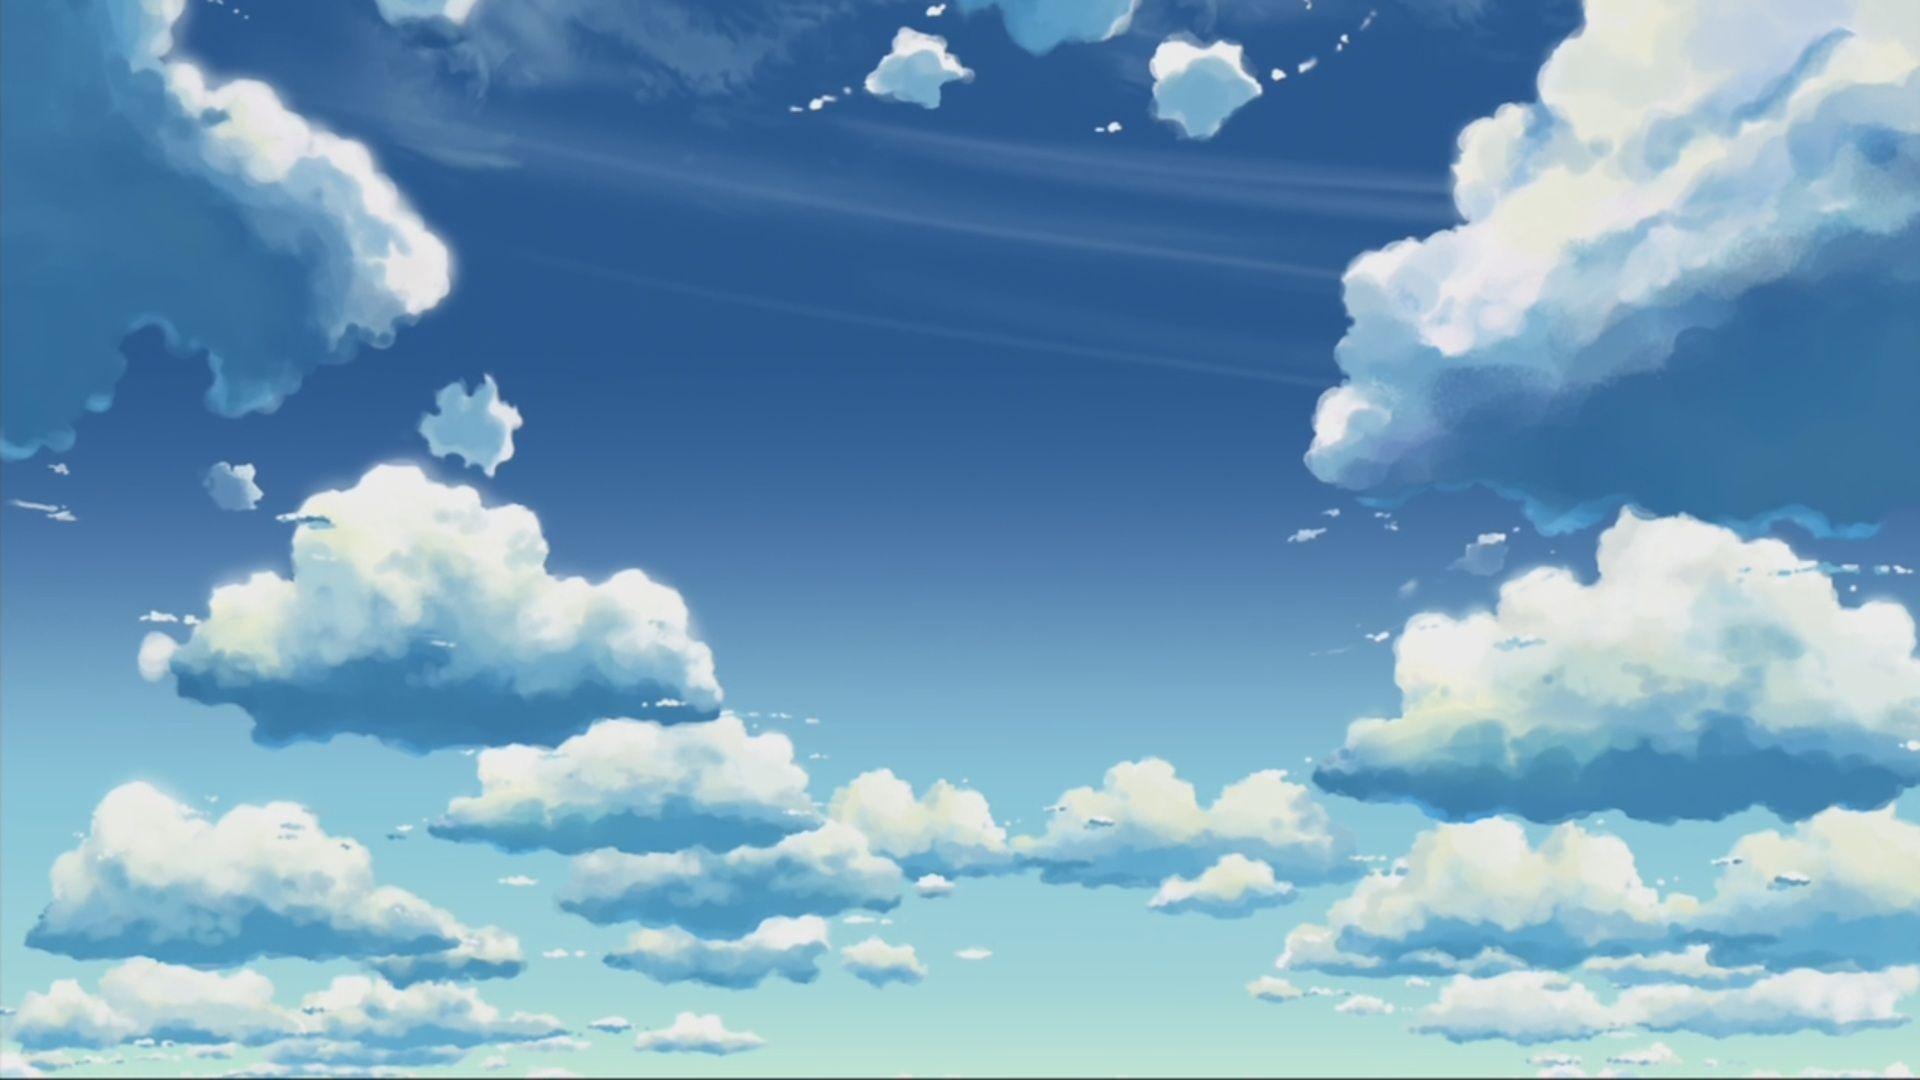 Anime Scenery wallpaper imagens) Cenario, Nuvem, Anime